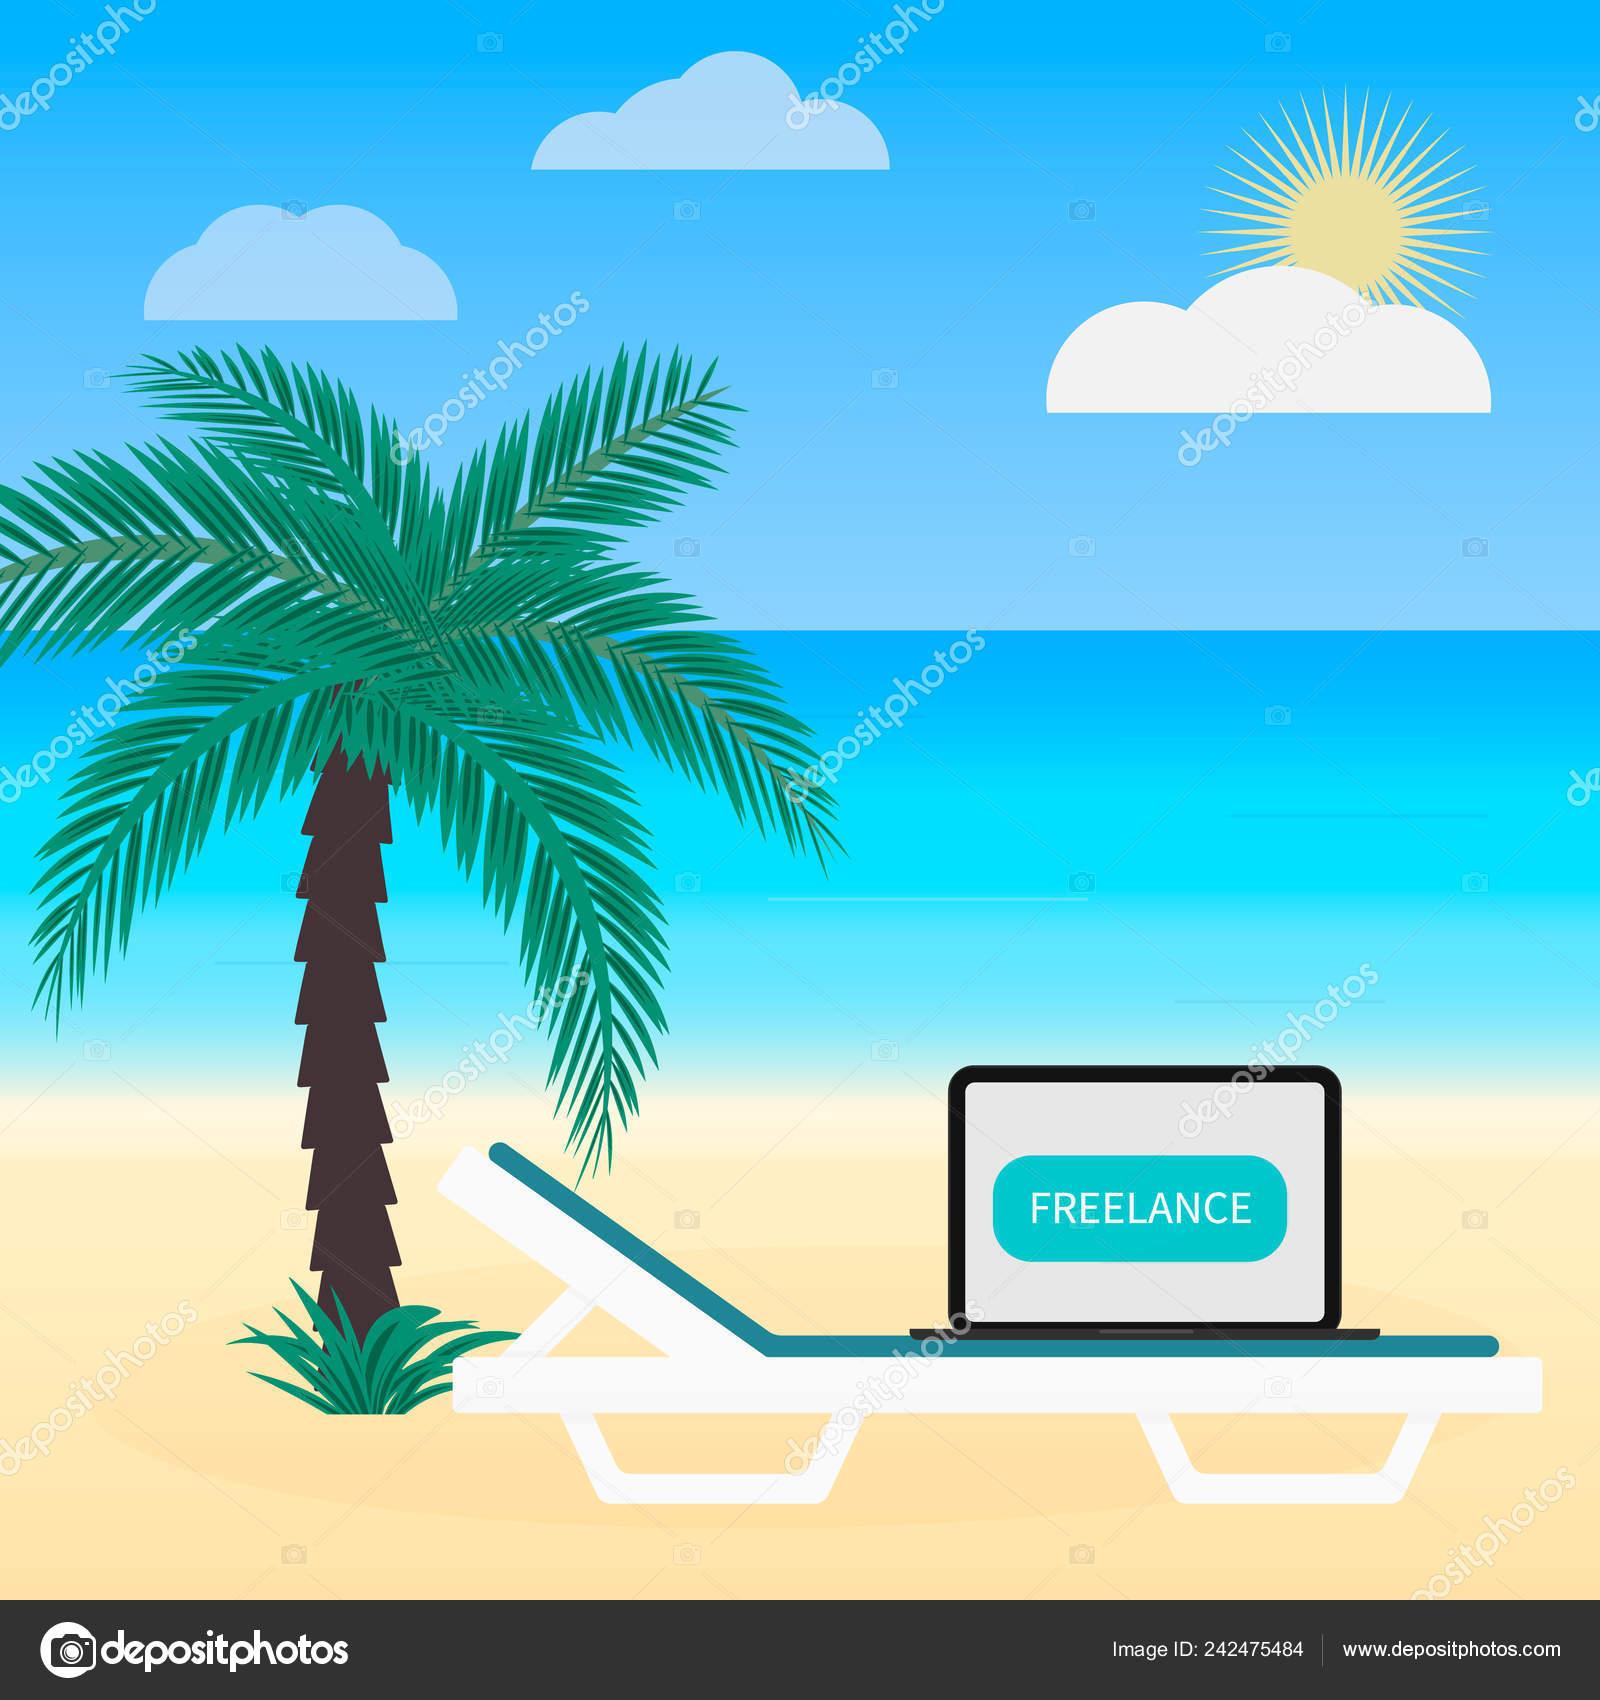 Freelance Work Vector Illustration Flat Style Laptop Sunbed Palm